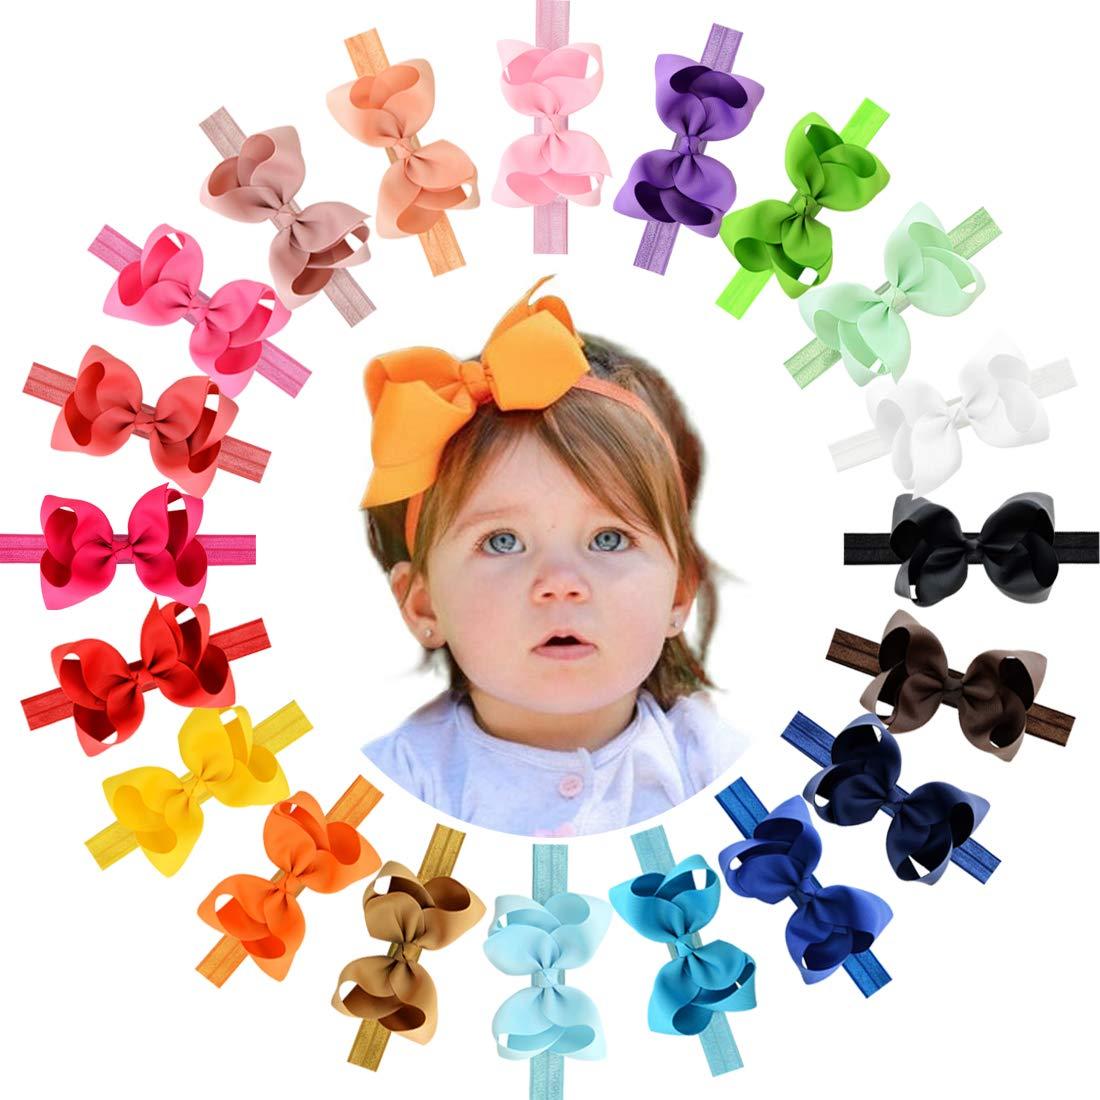 purple baby headband lilac headband bow infant headbands lavender baby headband hair bows for girls large hair bows double stack bows